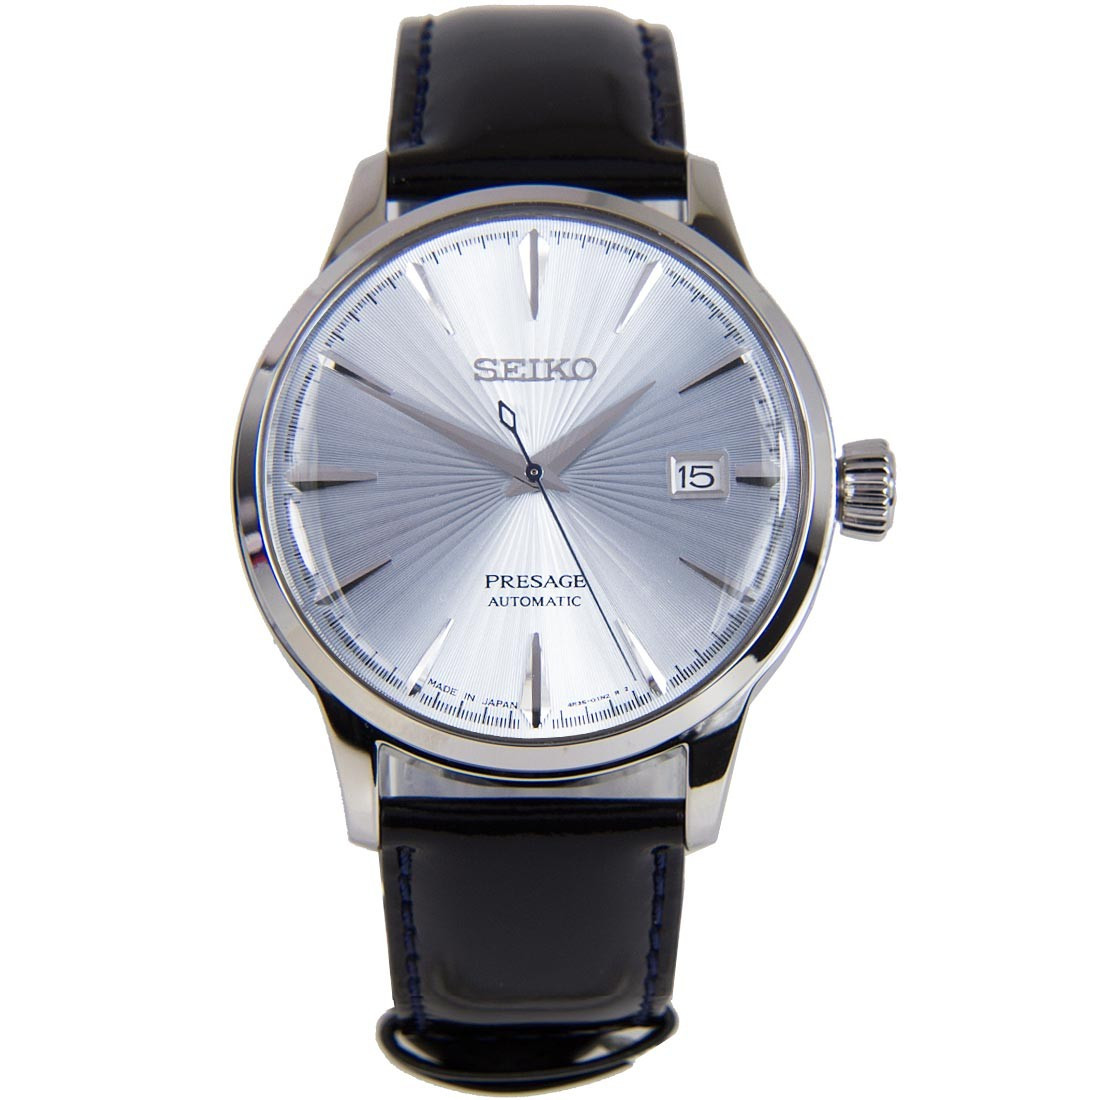 Часы Seiko SARY075 Automatic 4R35 (ВНУТРИЯПОНСКИЕ)